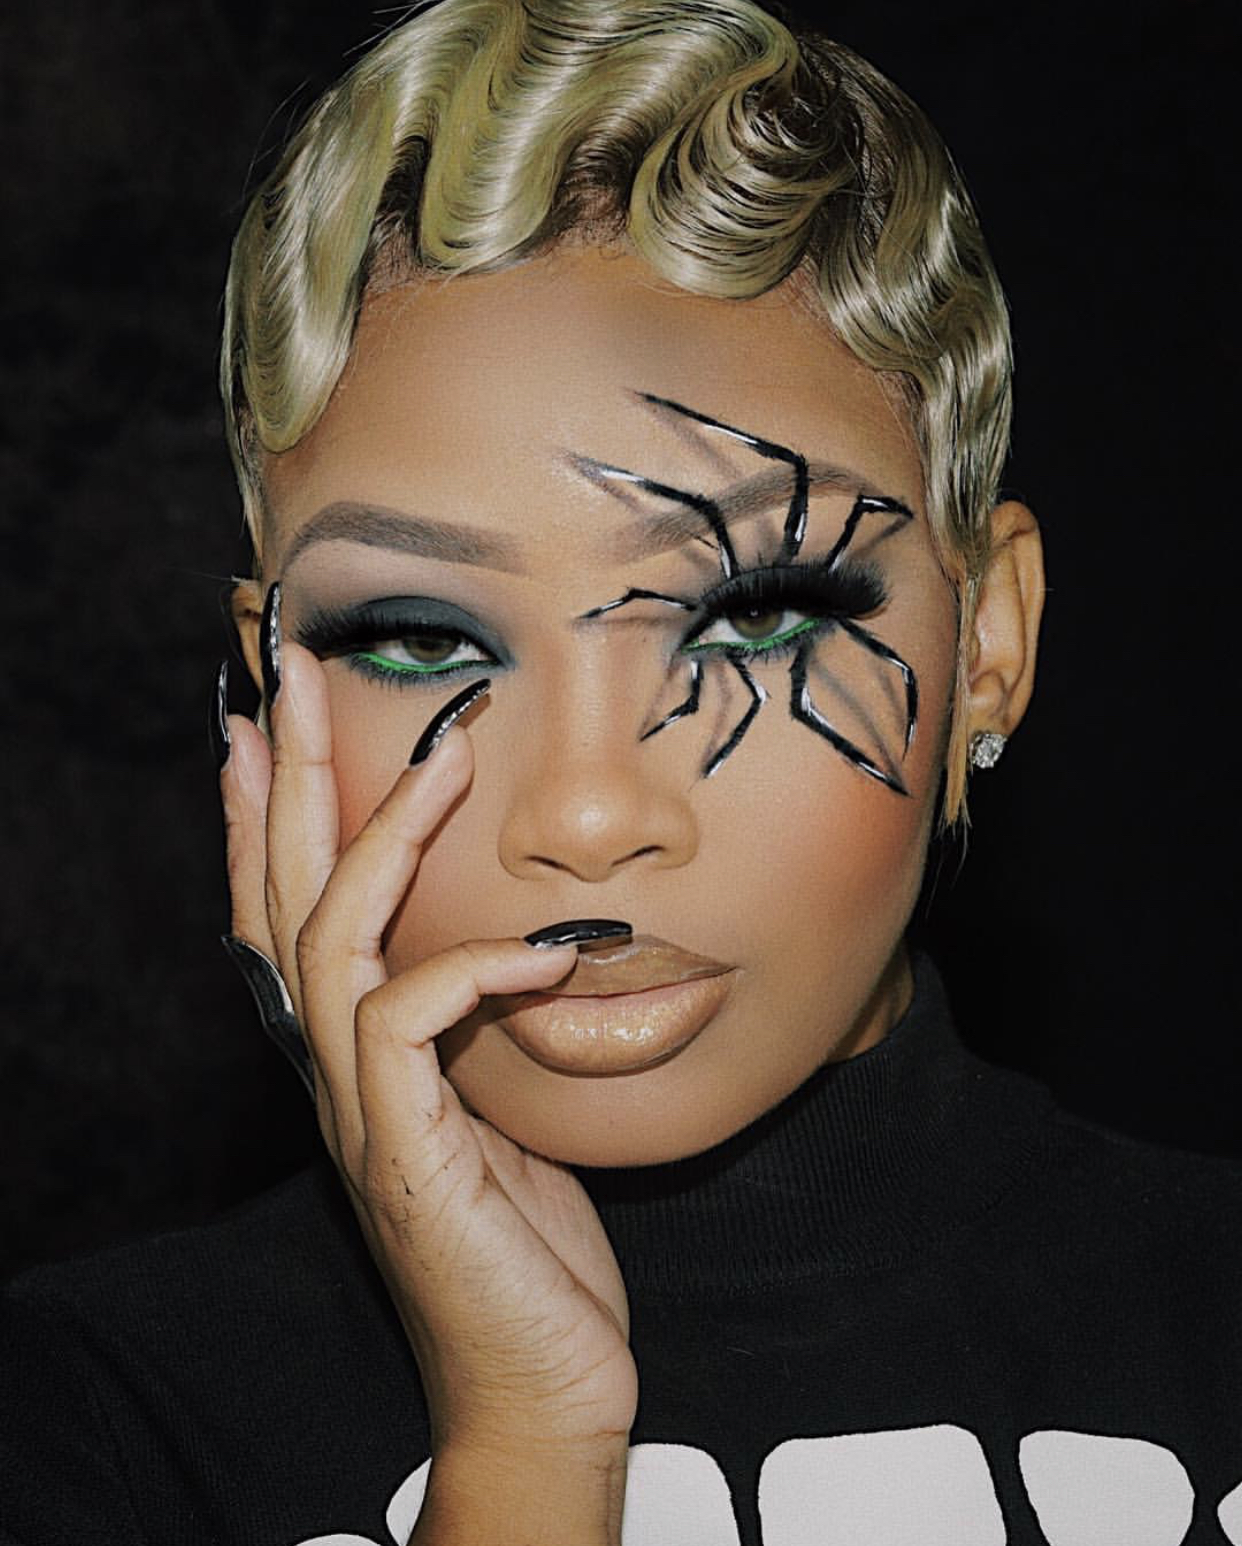 Get The Look: Aaliyah Jay's 3D Spider Makeup Tutorial